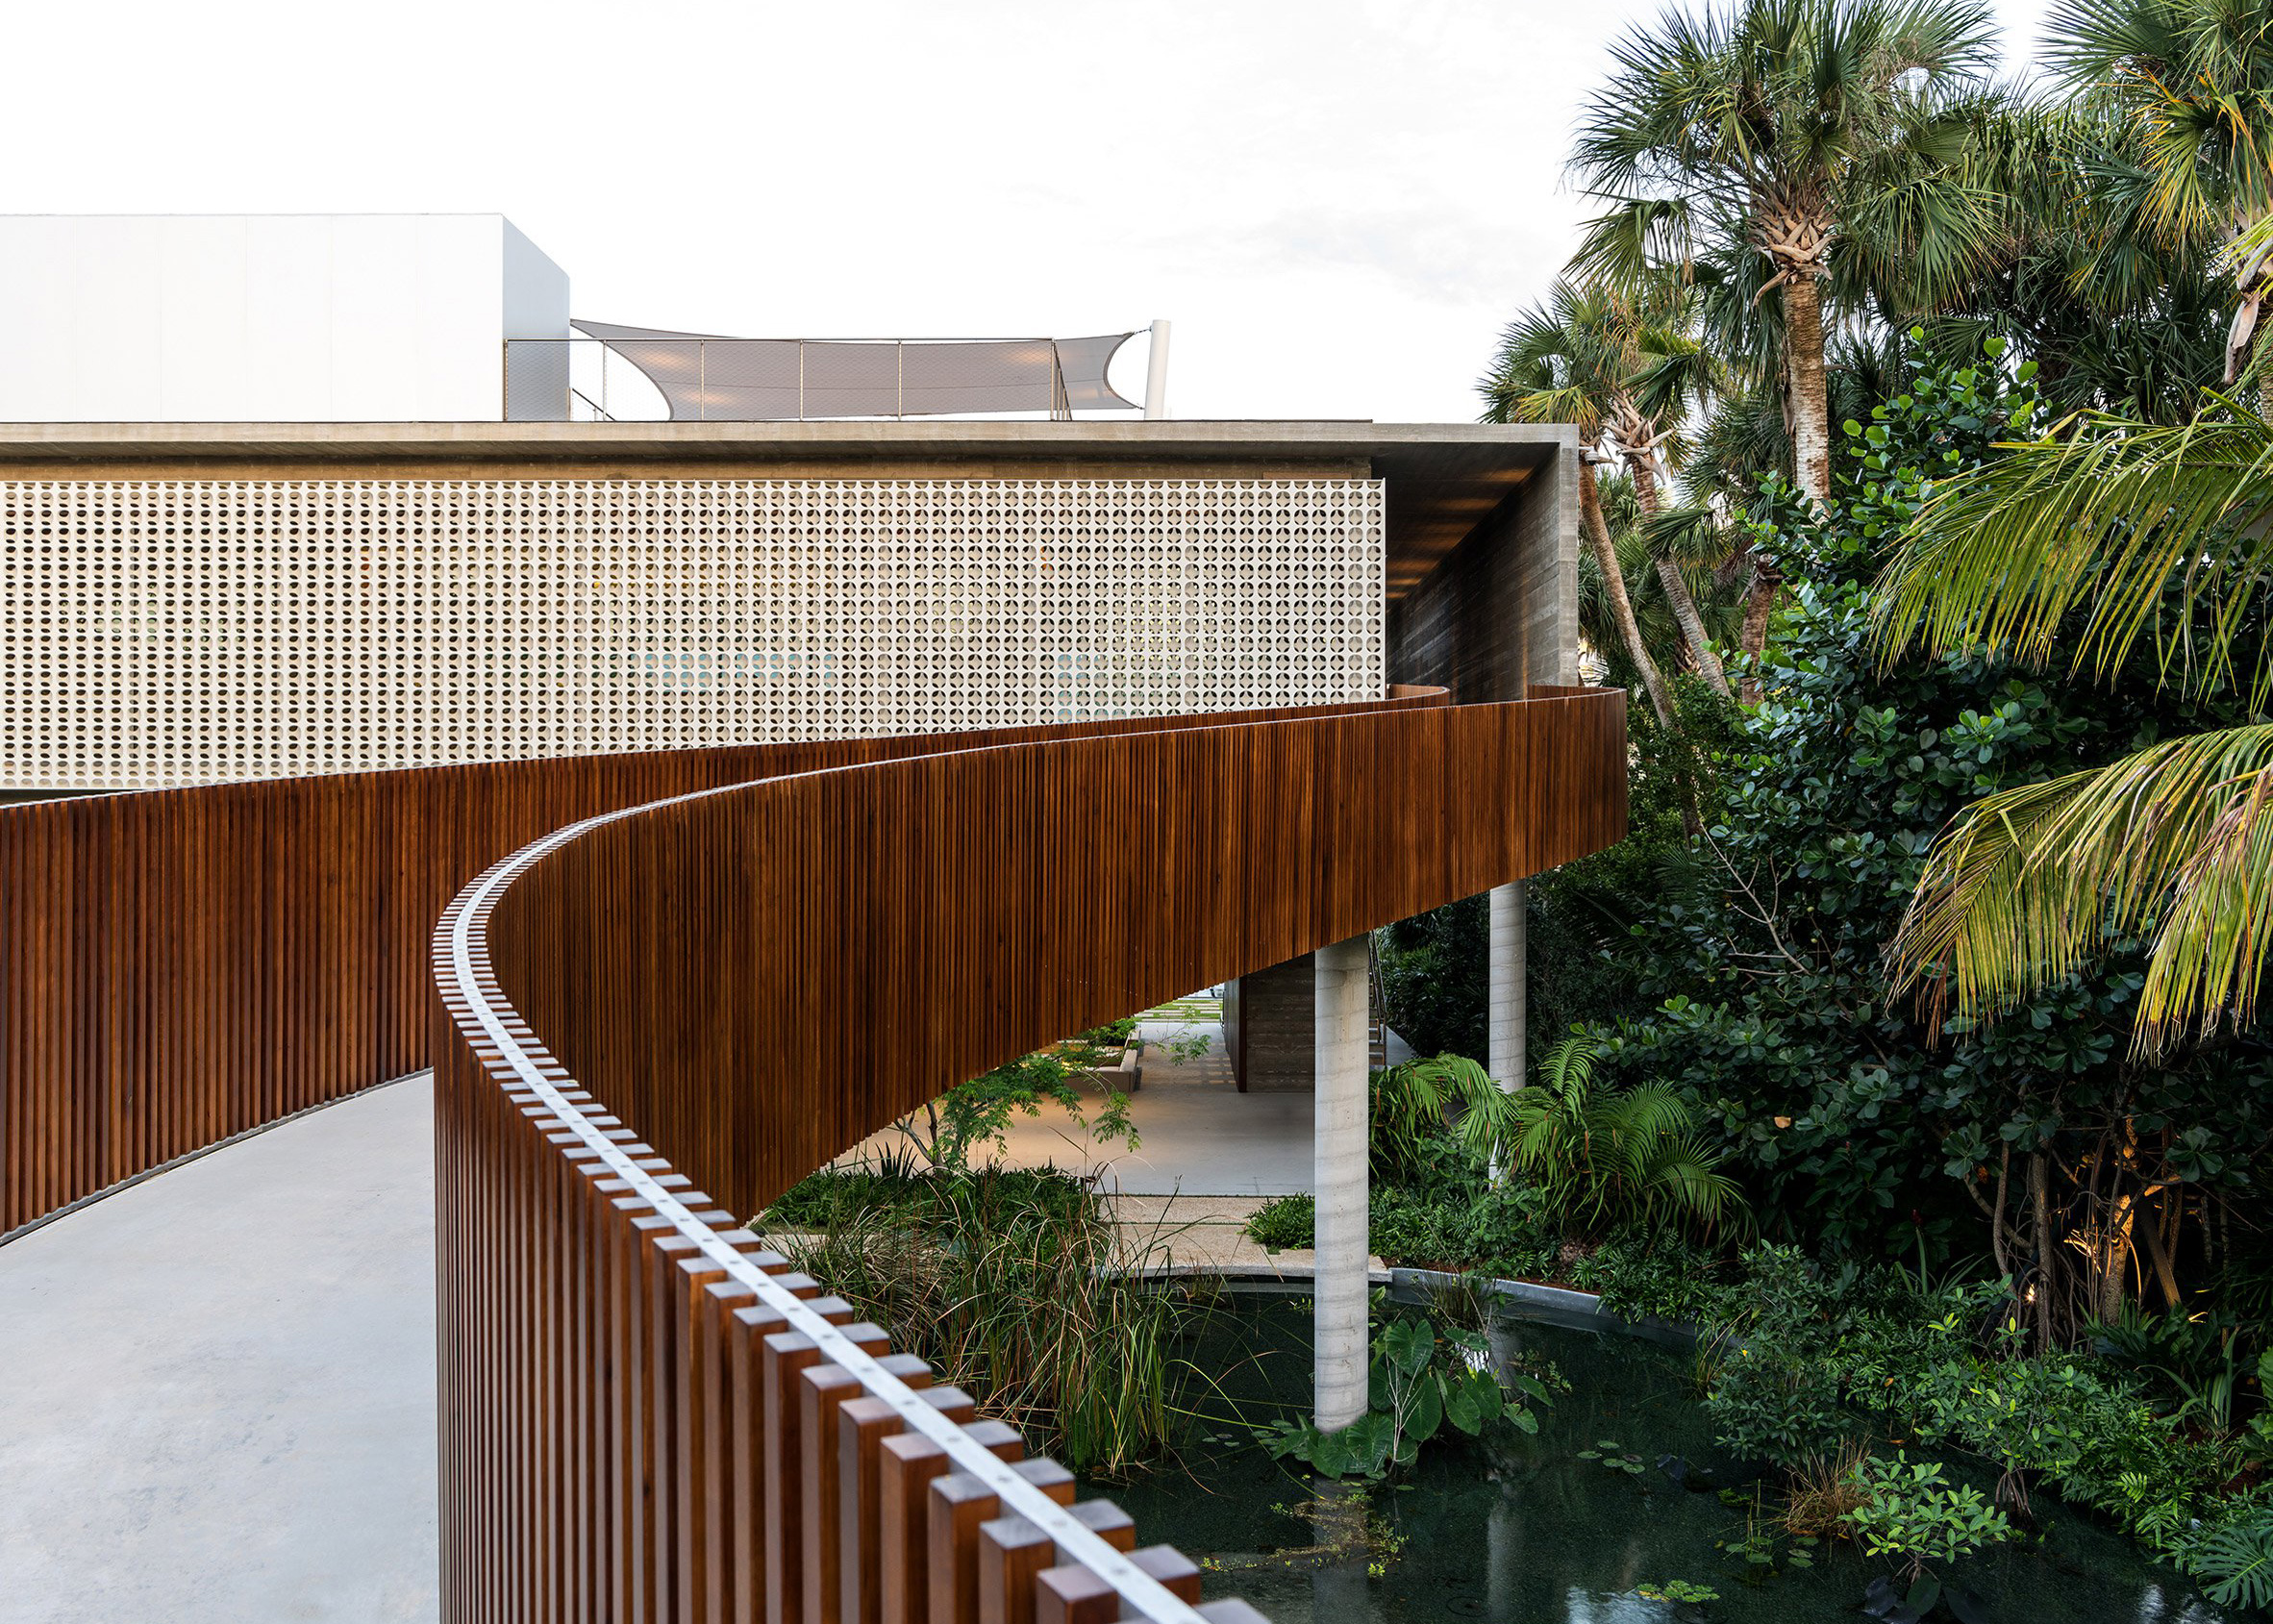 Pine Tree Drive, Florida, by Studio MK27